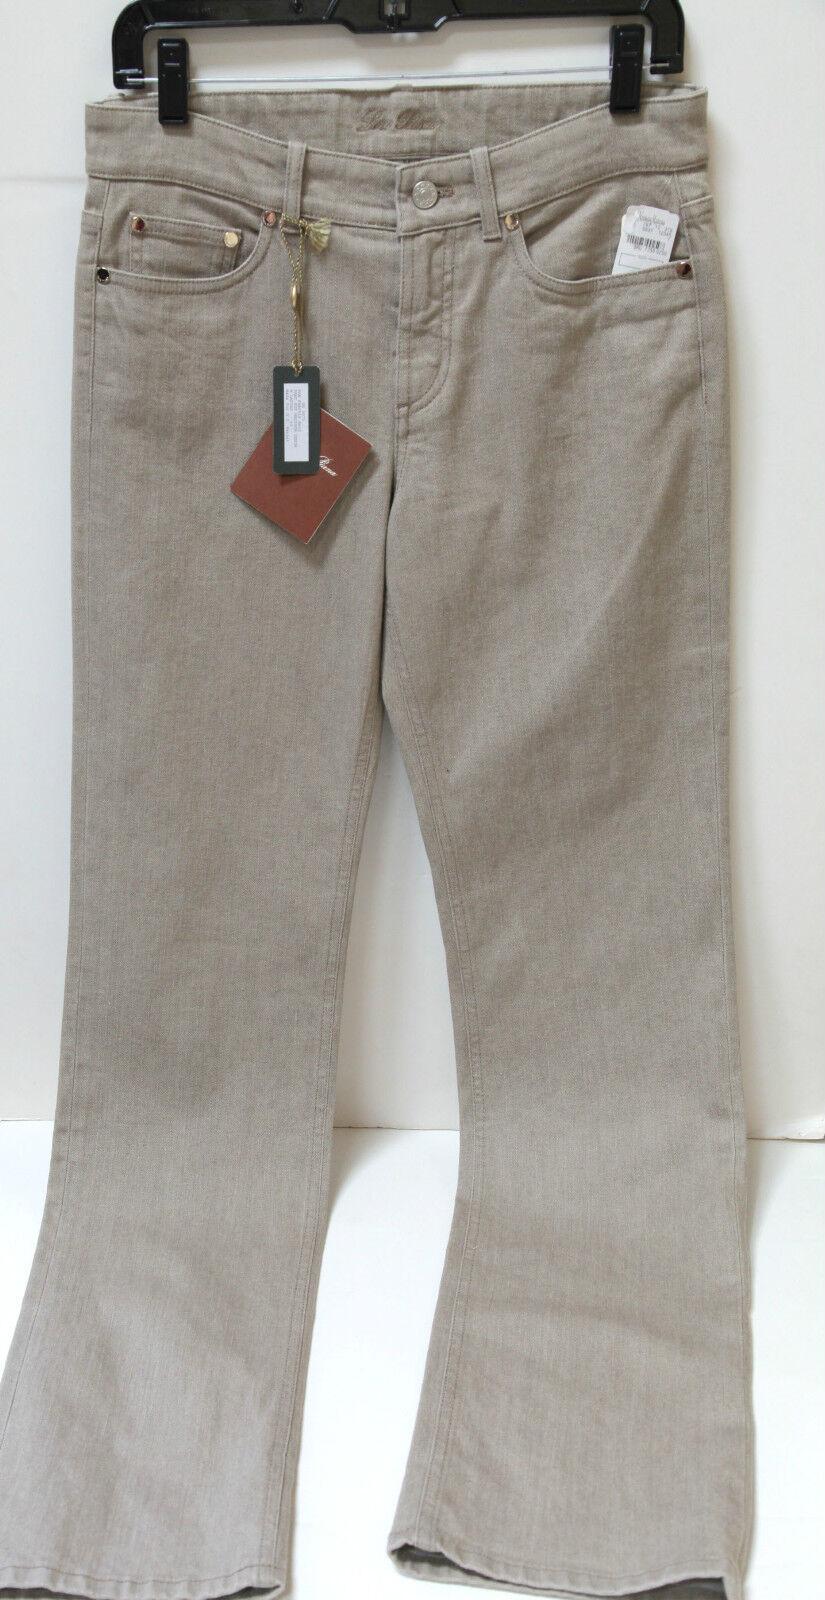 NWT Lgold Piana  Womens Guy Madison Denim Tan Jeans 42 6 FS